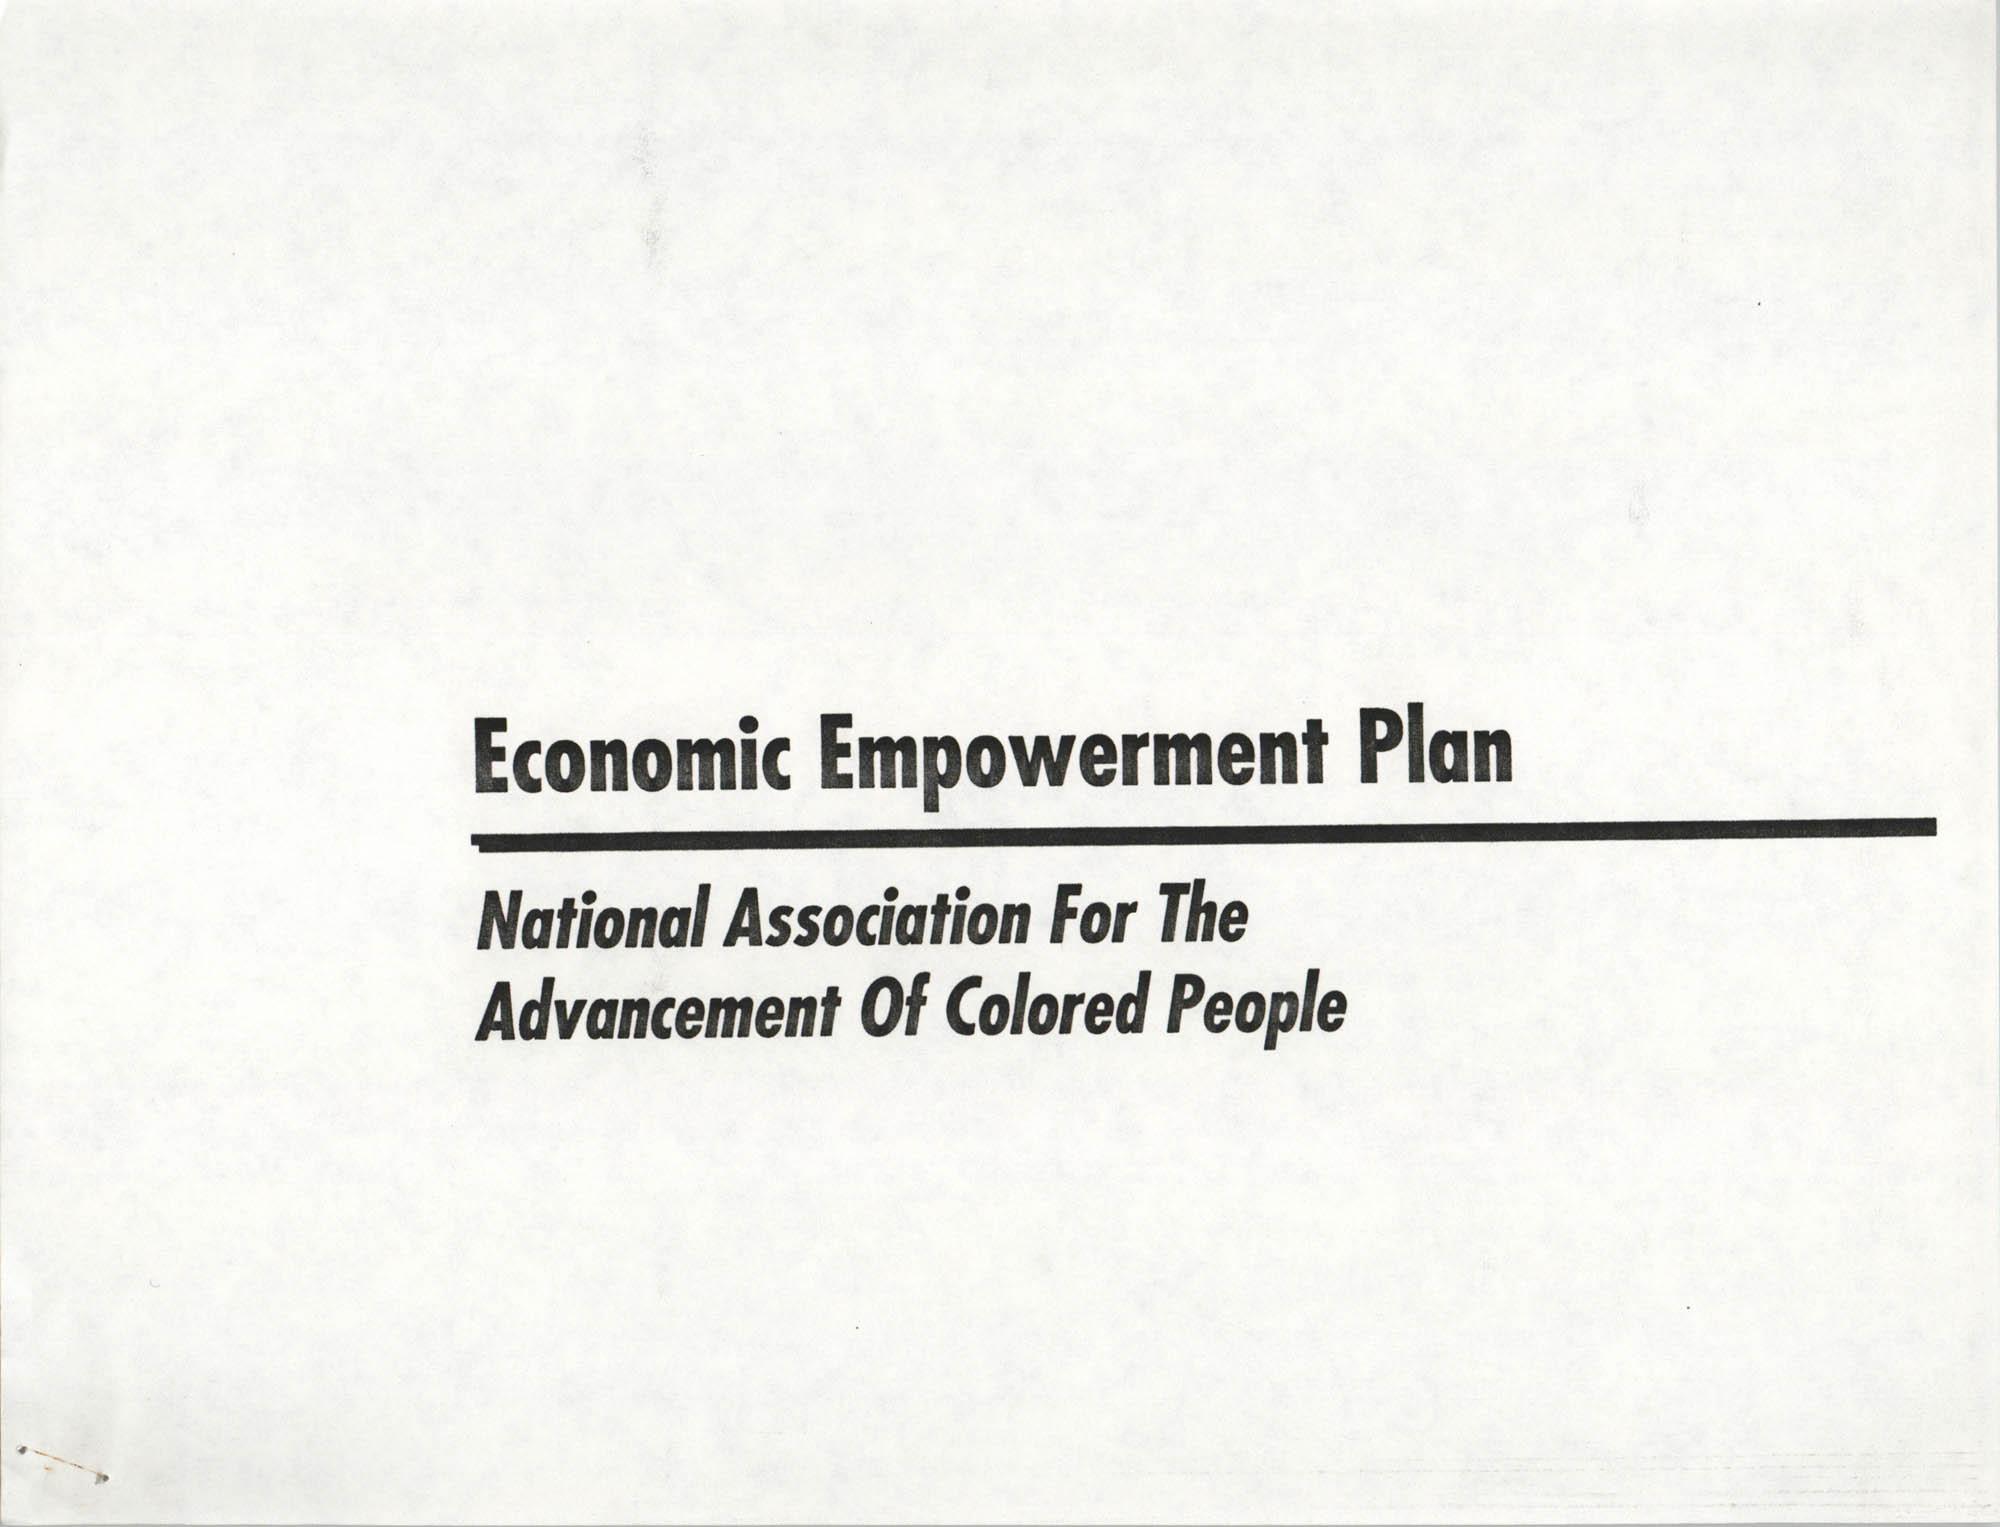 Economic Empowerment Plan, Cover